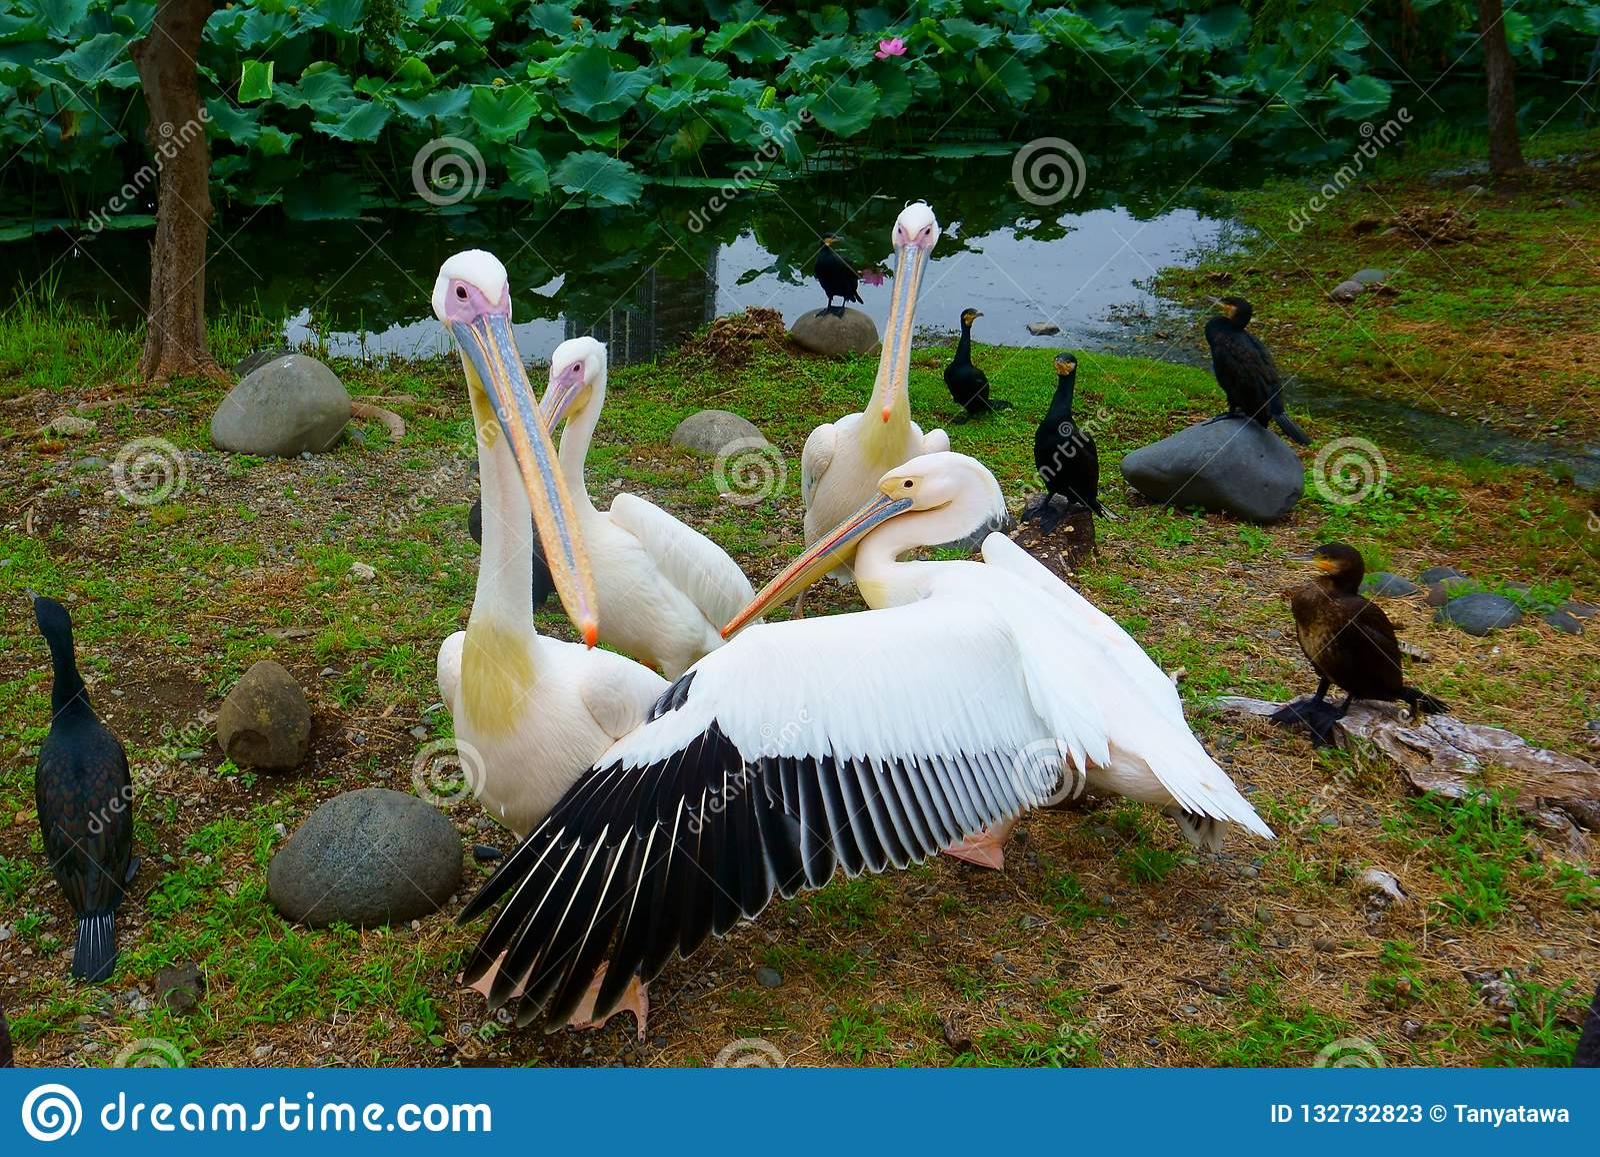 Birds pelicans ducks on shore of pond